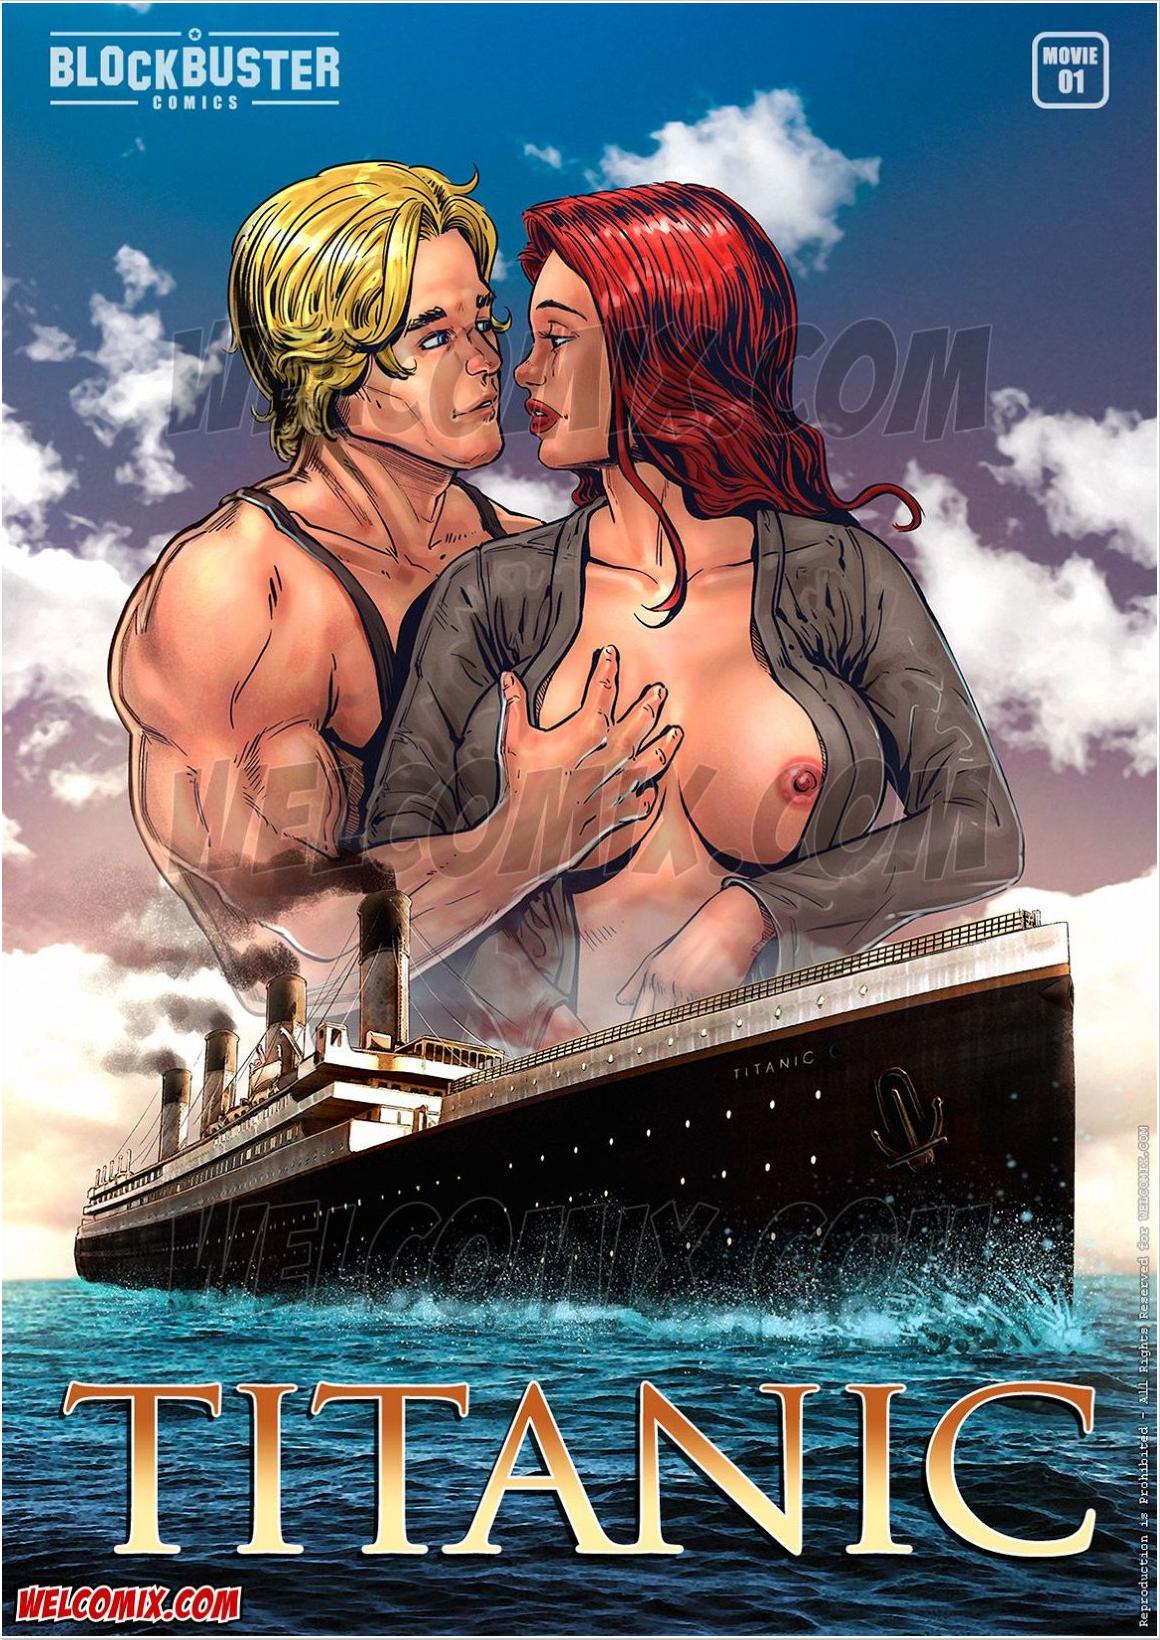 SureFap xxx porno Titanic - [WelComix] - BlockBuster Comics 01 - Titanic